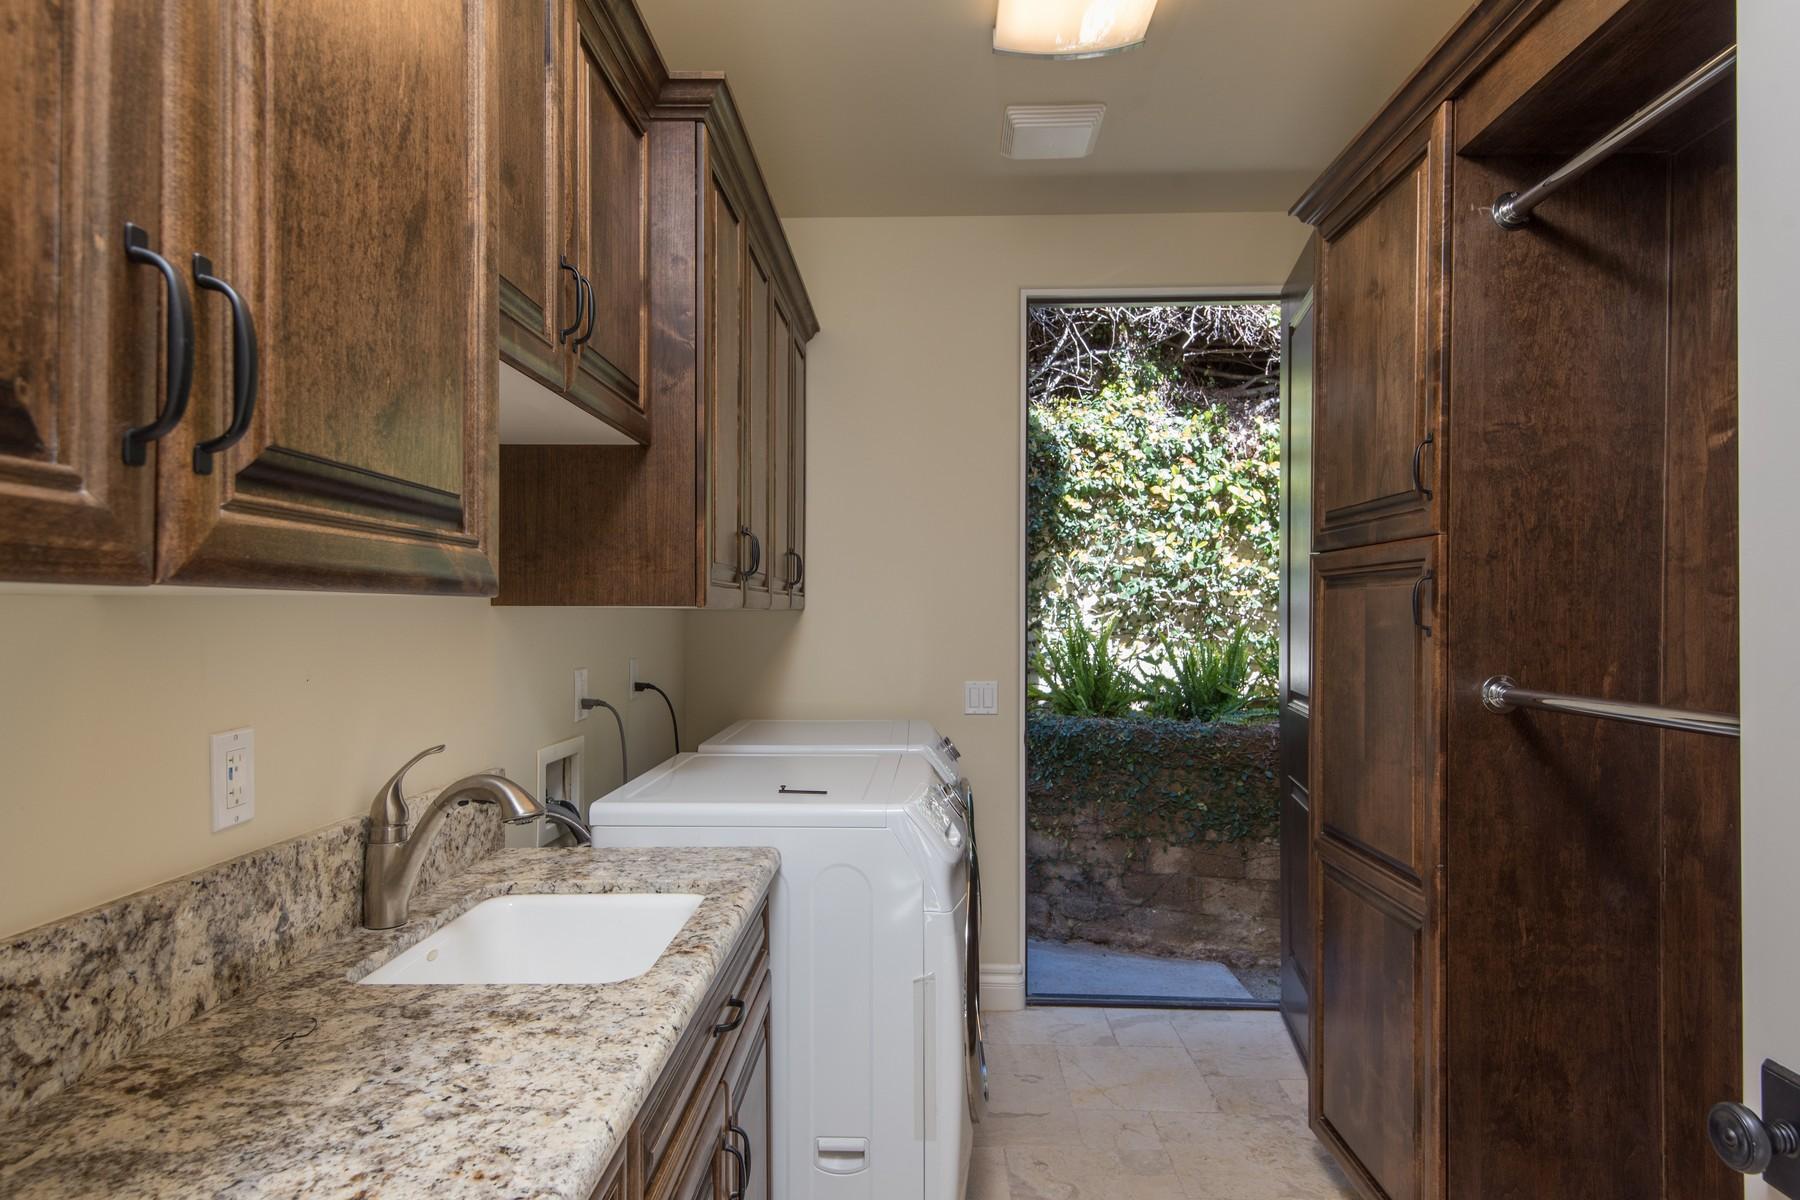 Additional photo for property listing at 8327 La Jolla Shores Drive  La Jolla, Californie 92037 États-Unis